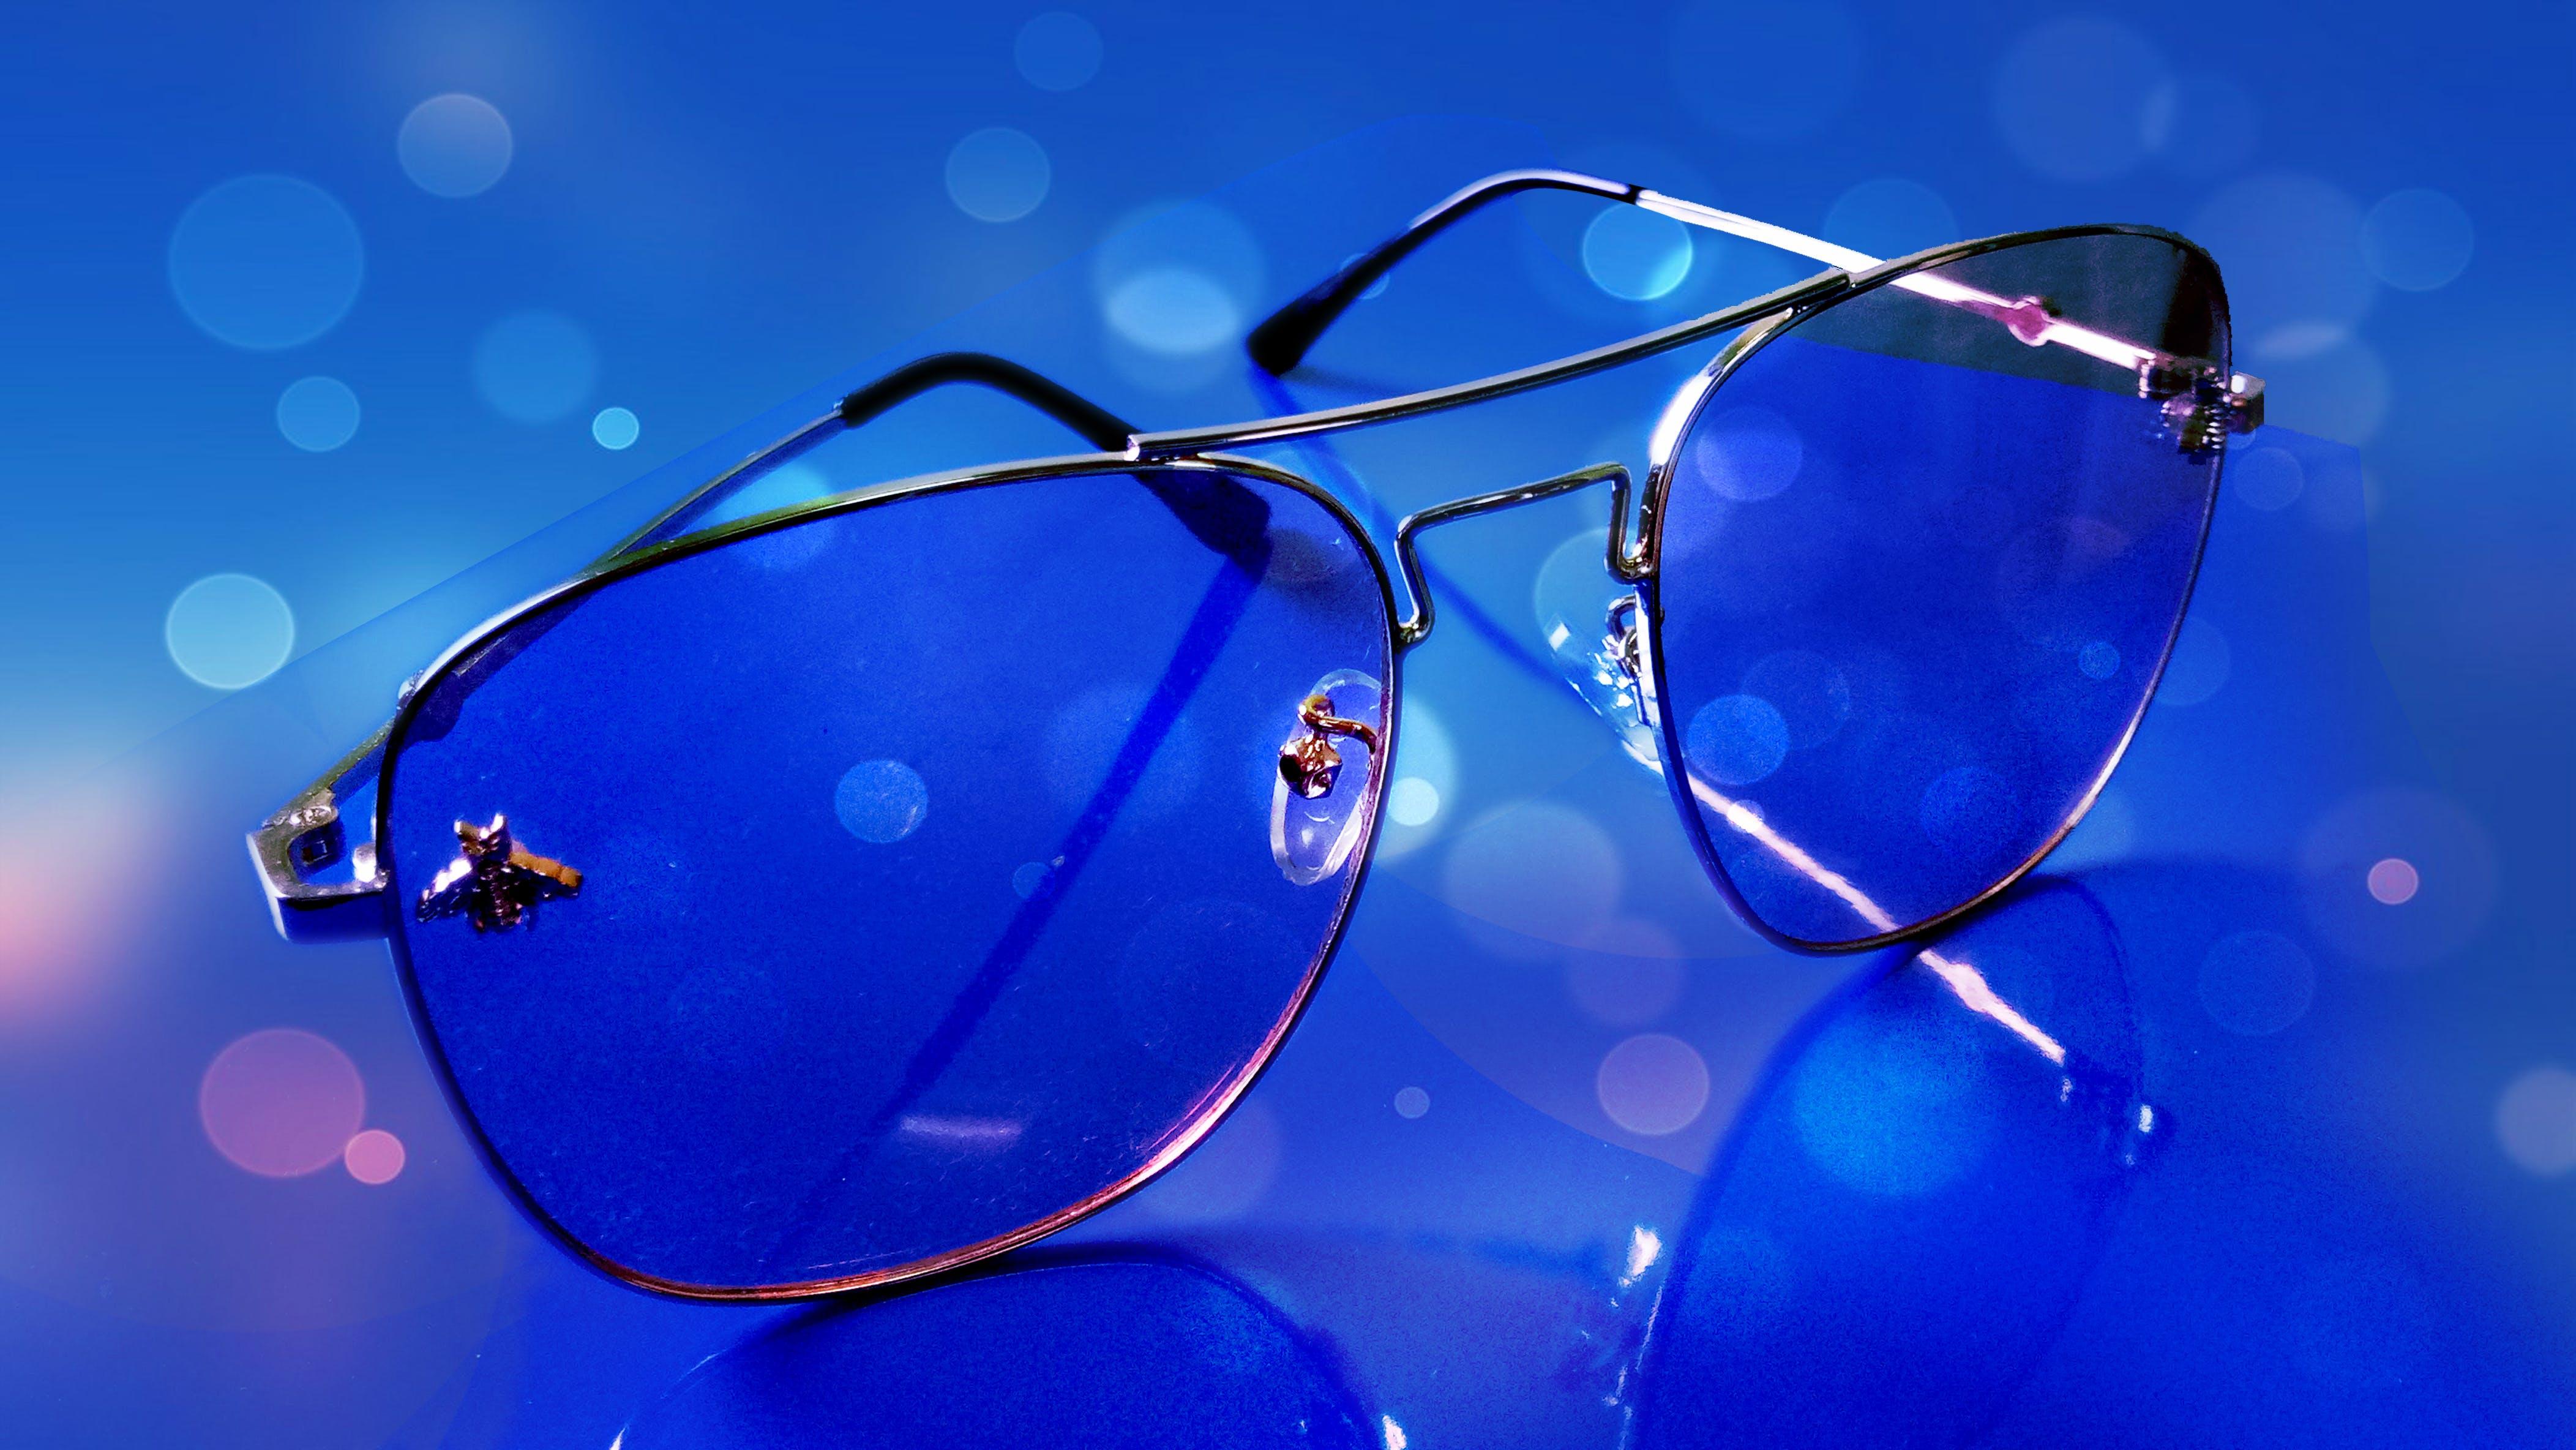 Free stock photo of sun glasses, blue background